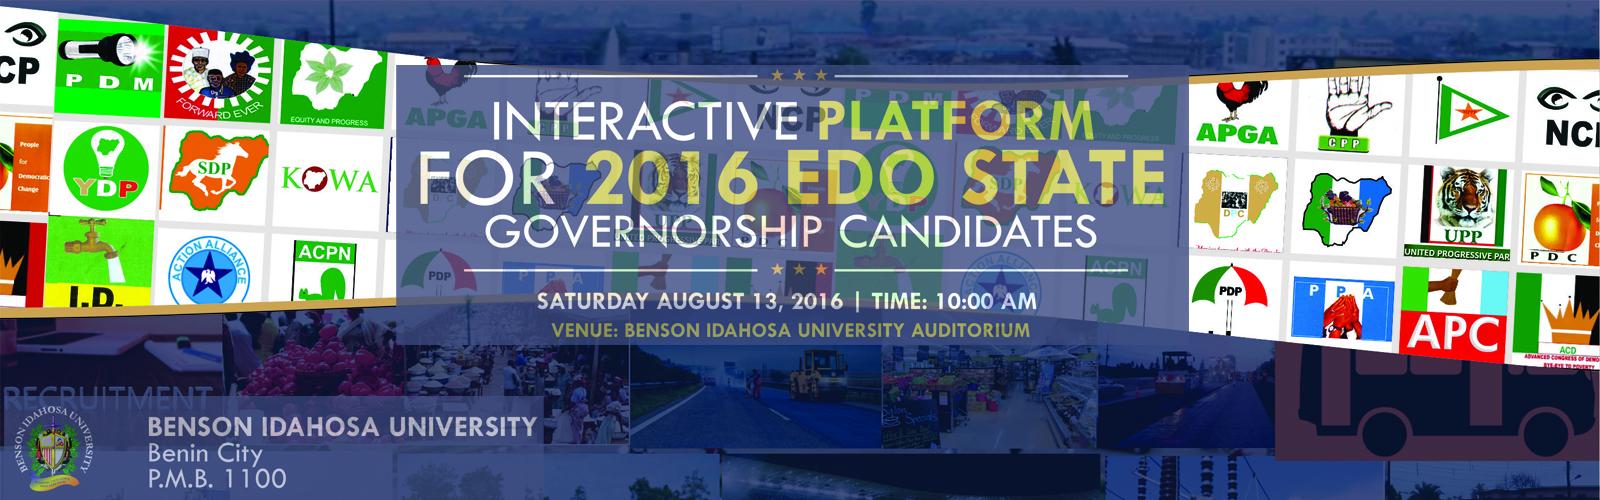 Political Interactive platform